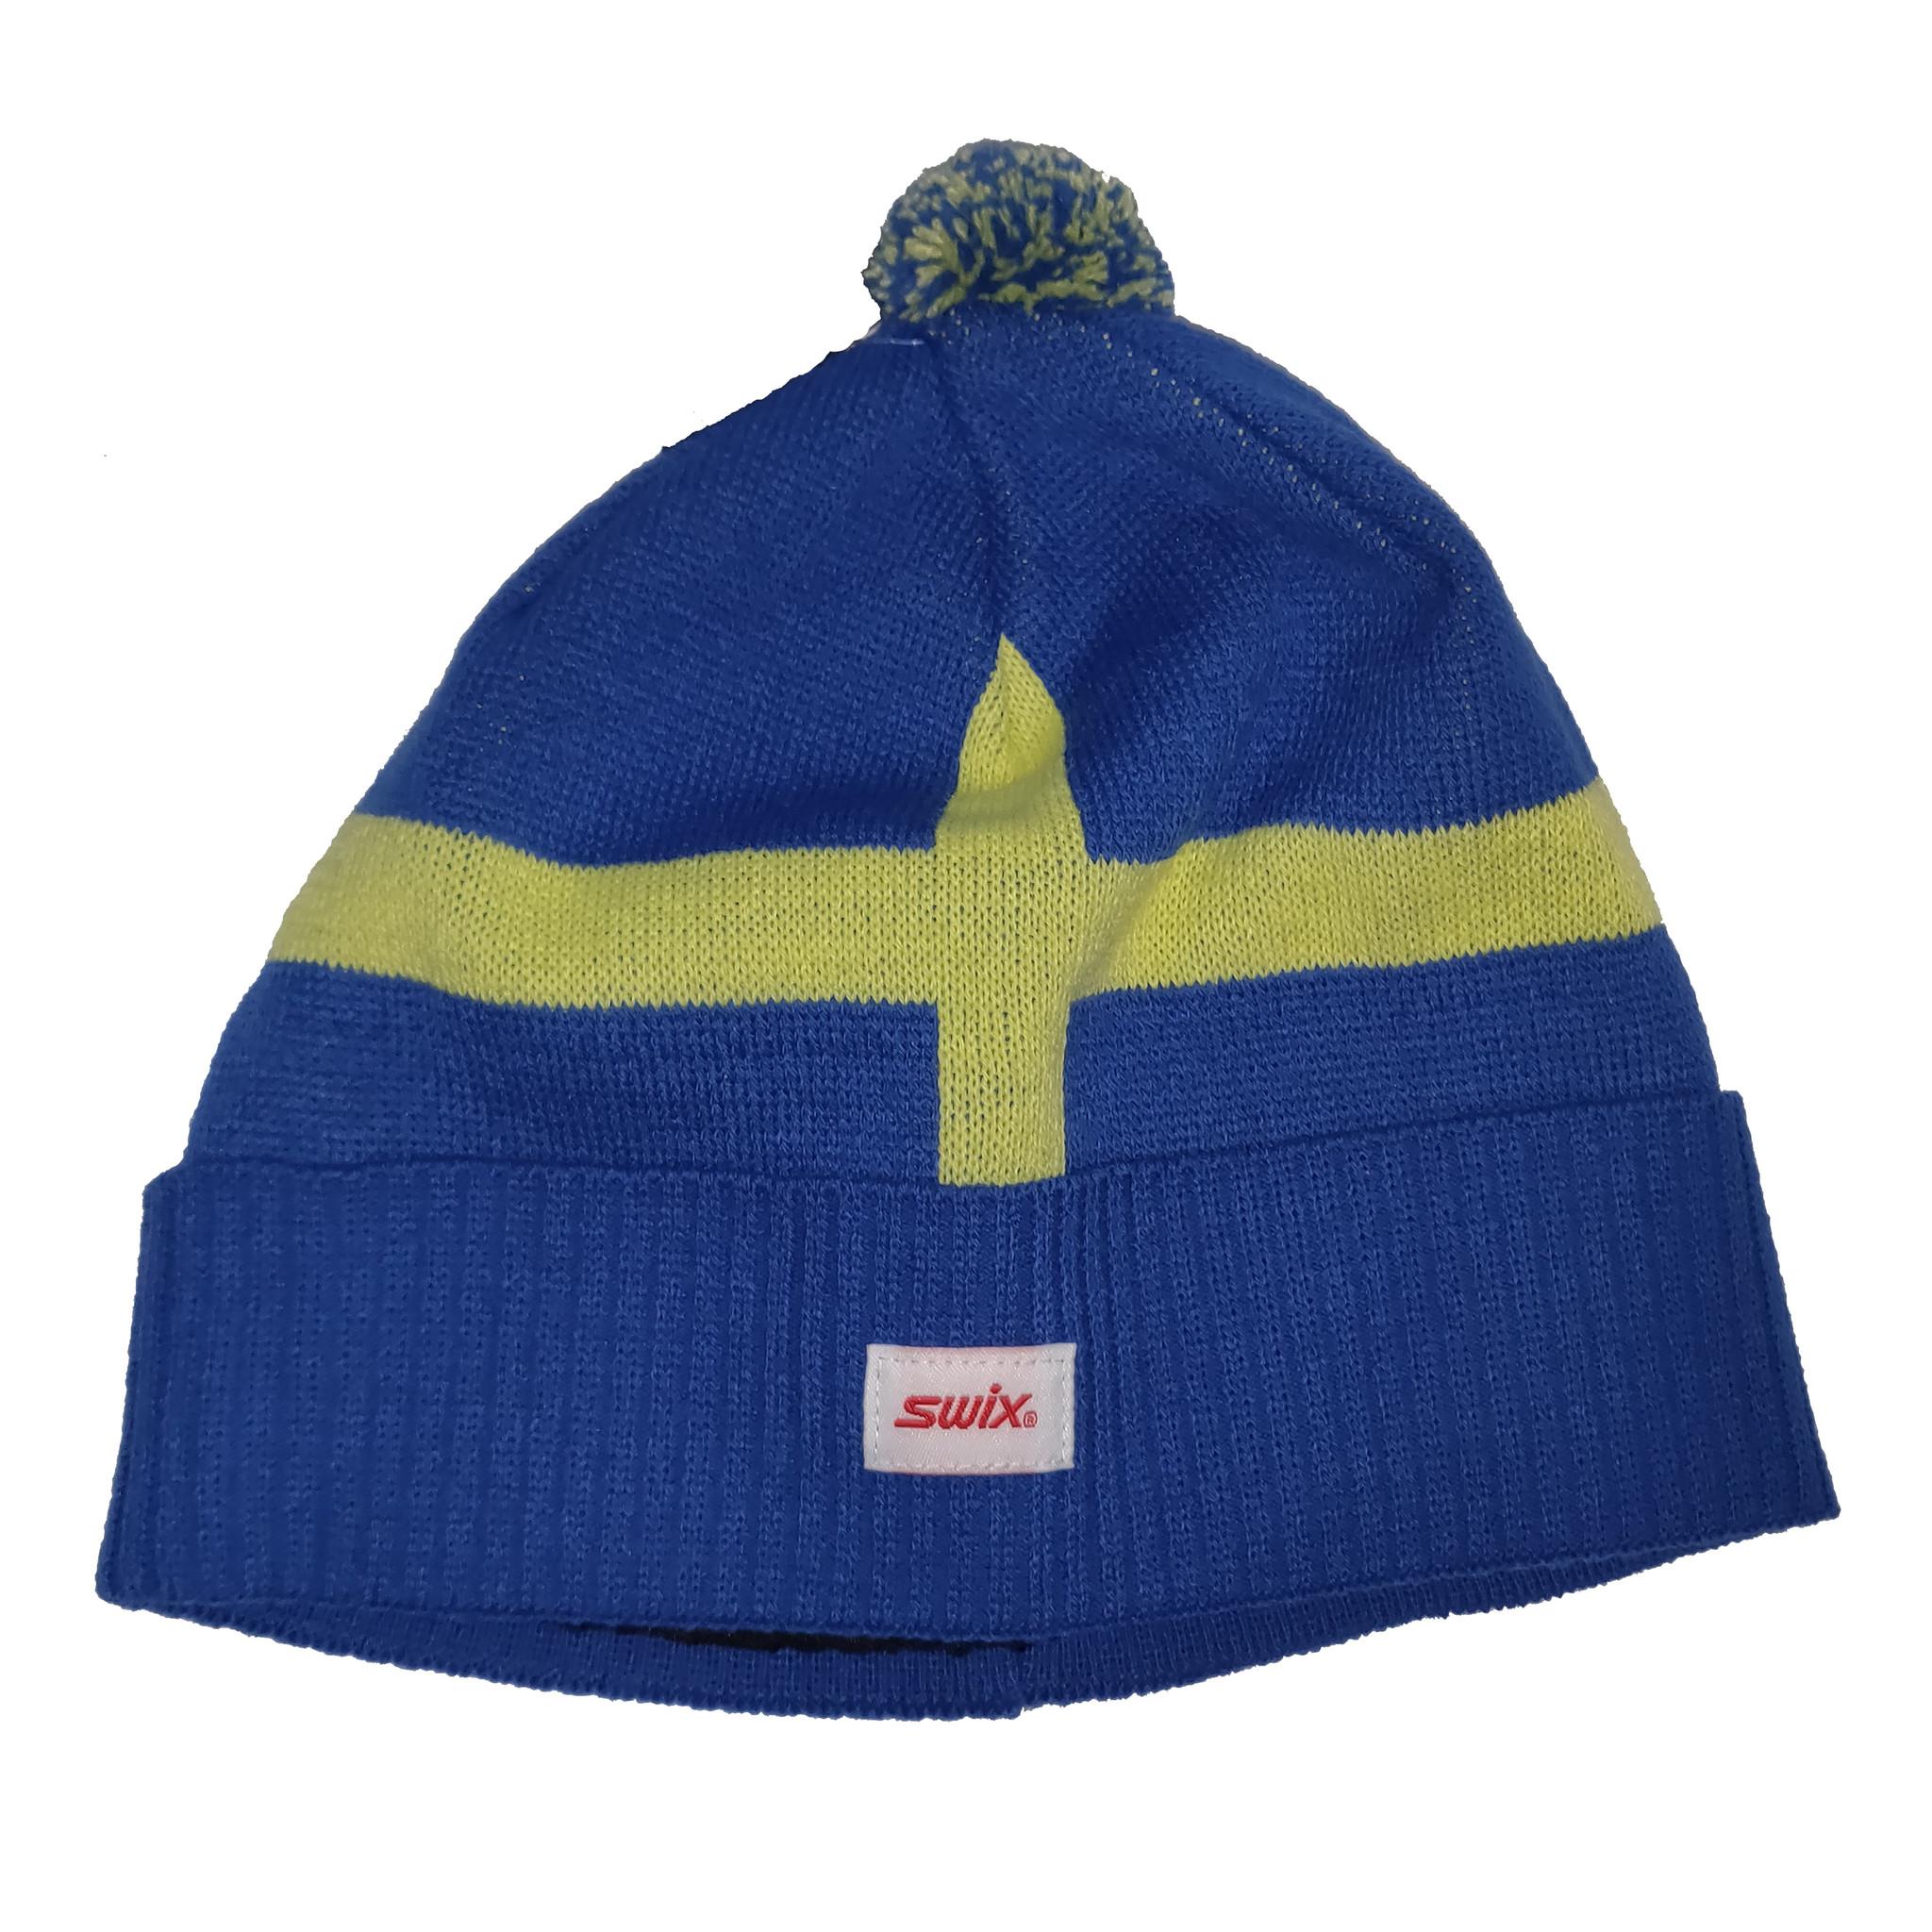 Swix Sweden Pom Hat